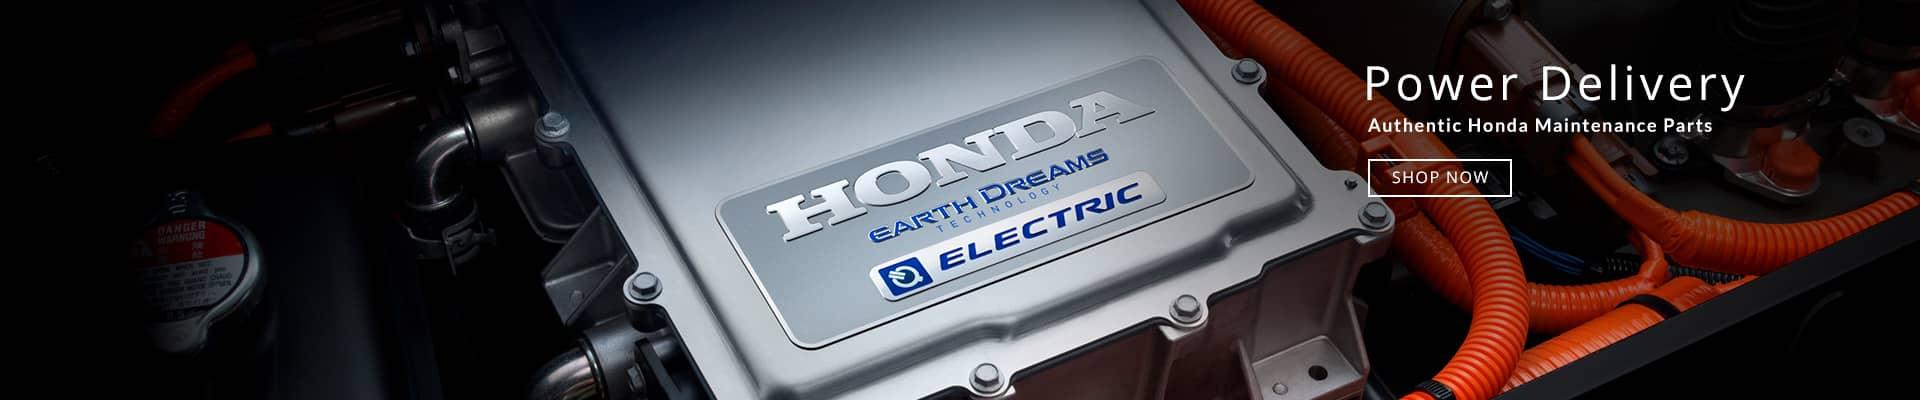 Honda Maintenance Parts